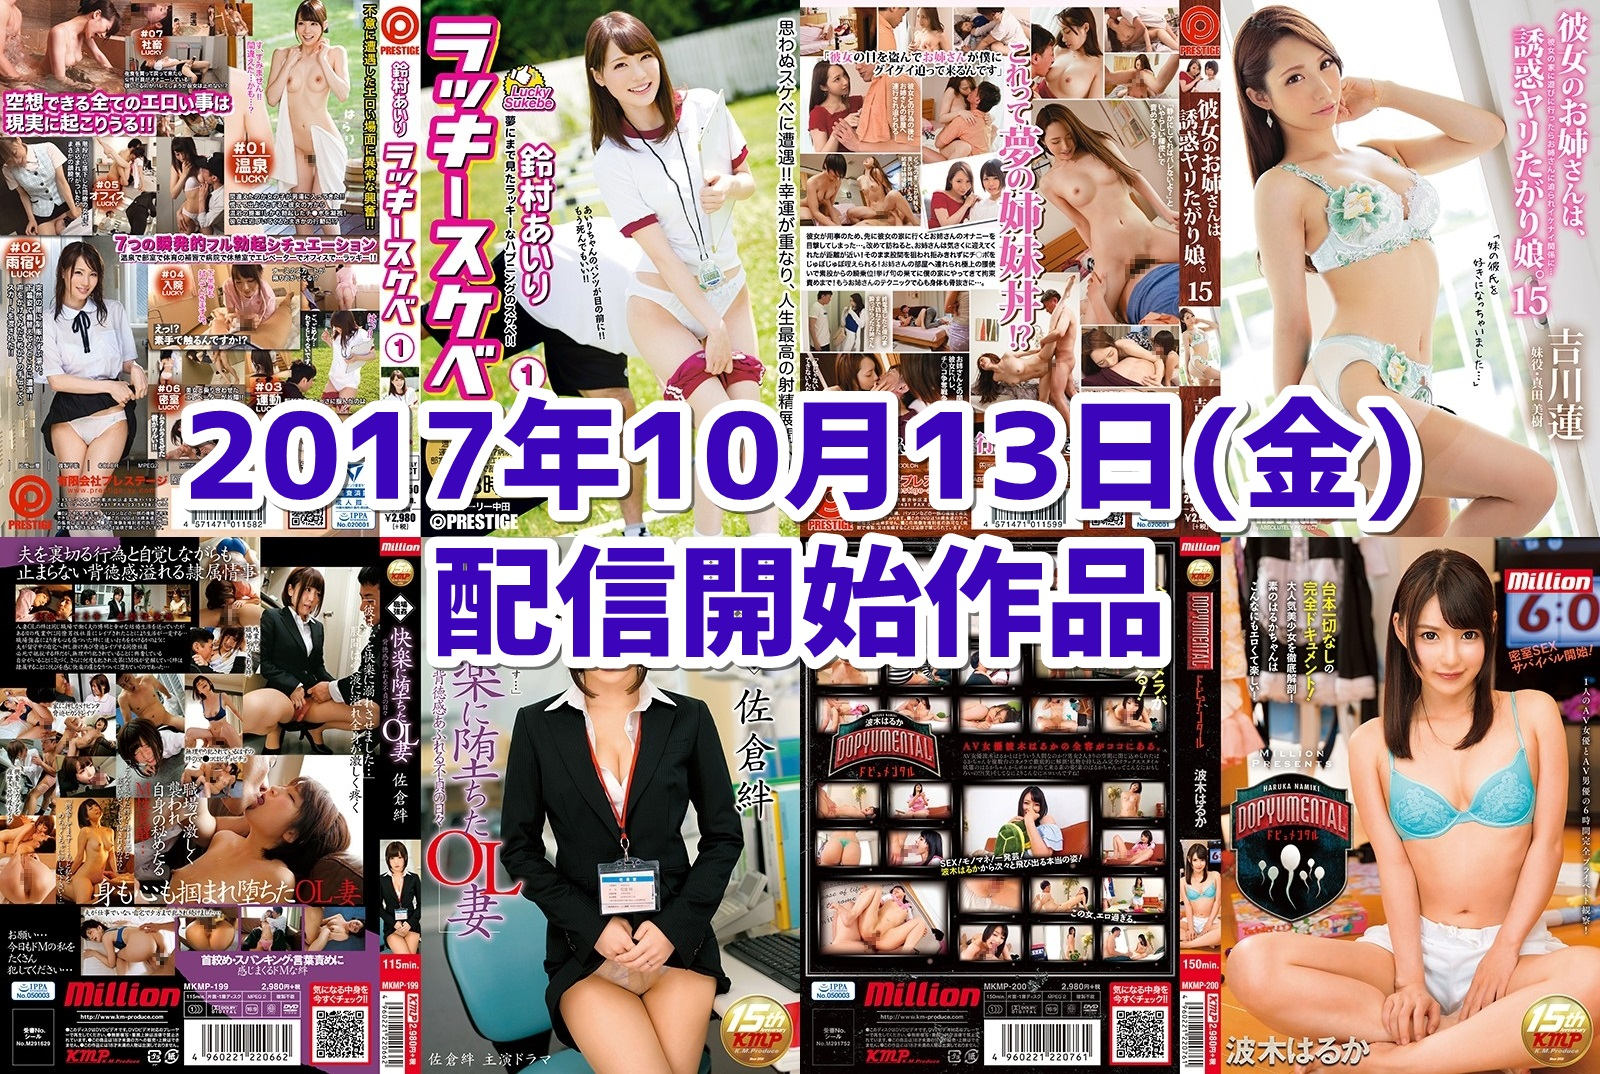 118abp00650pl-tile.jpg